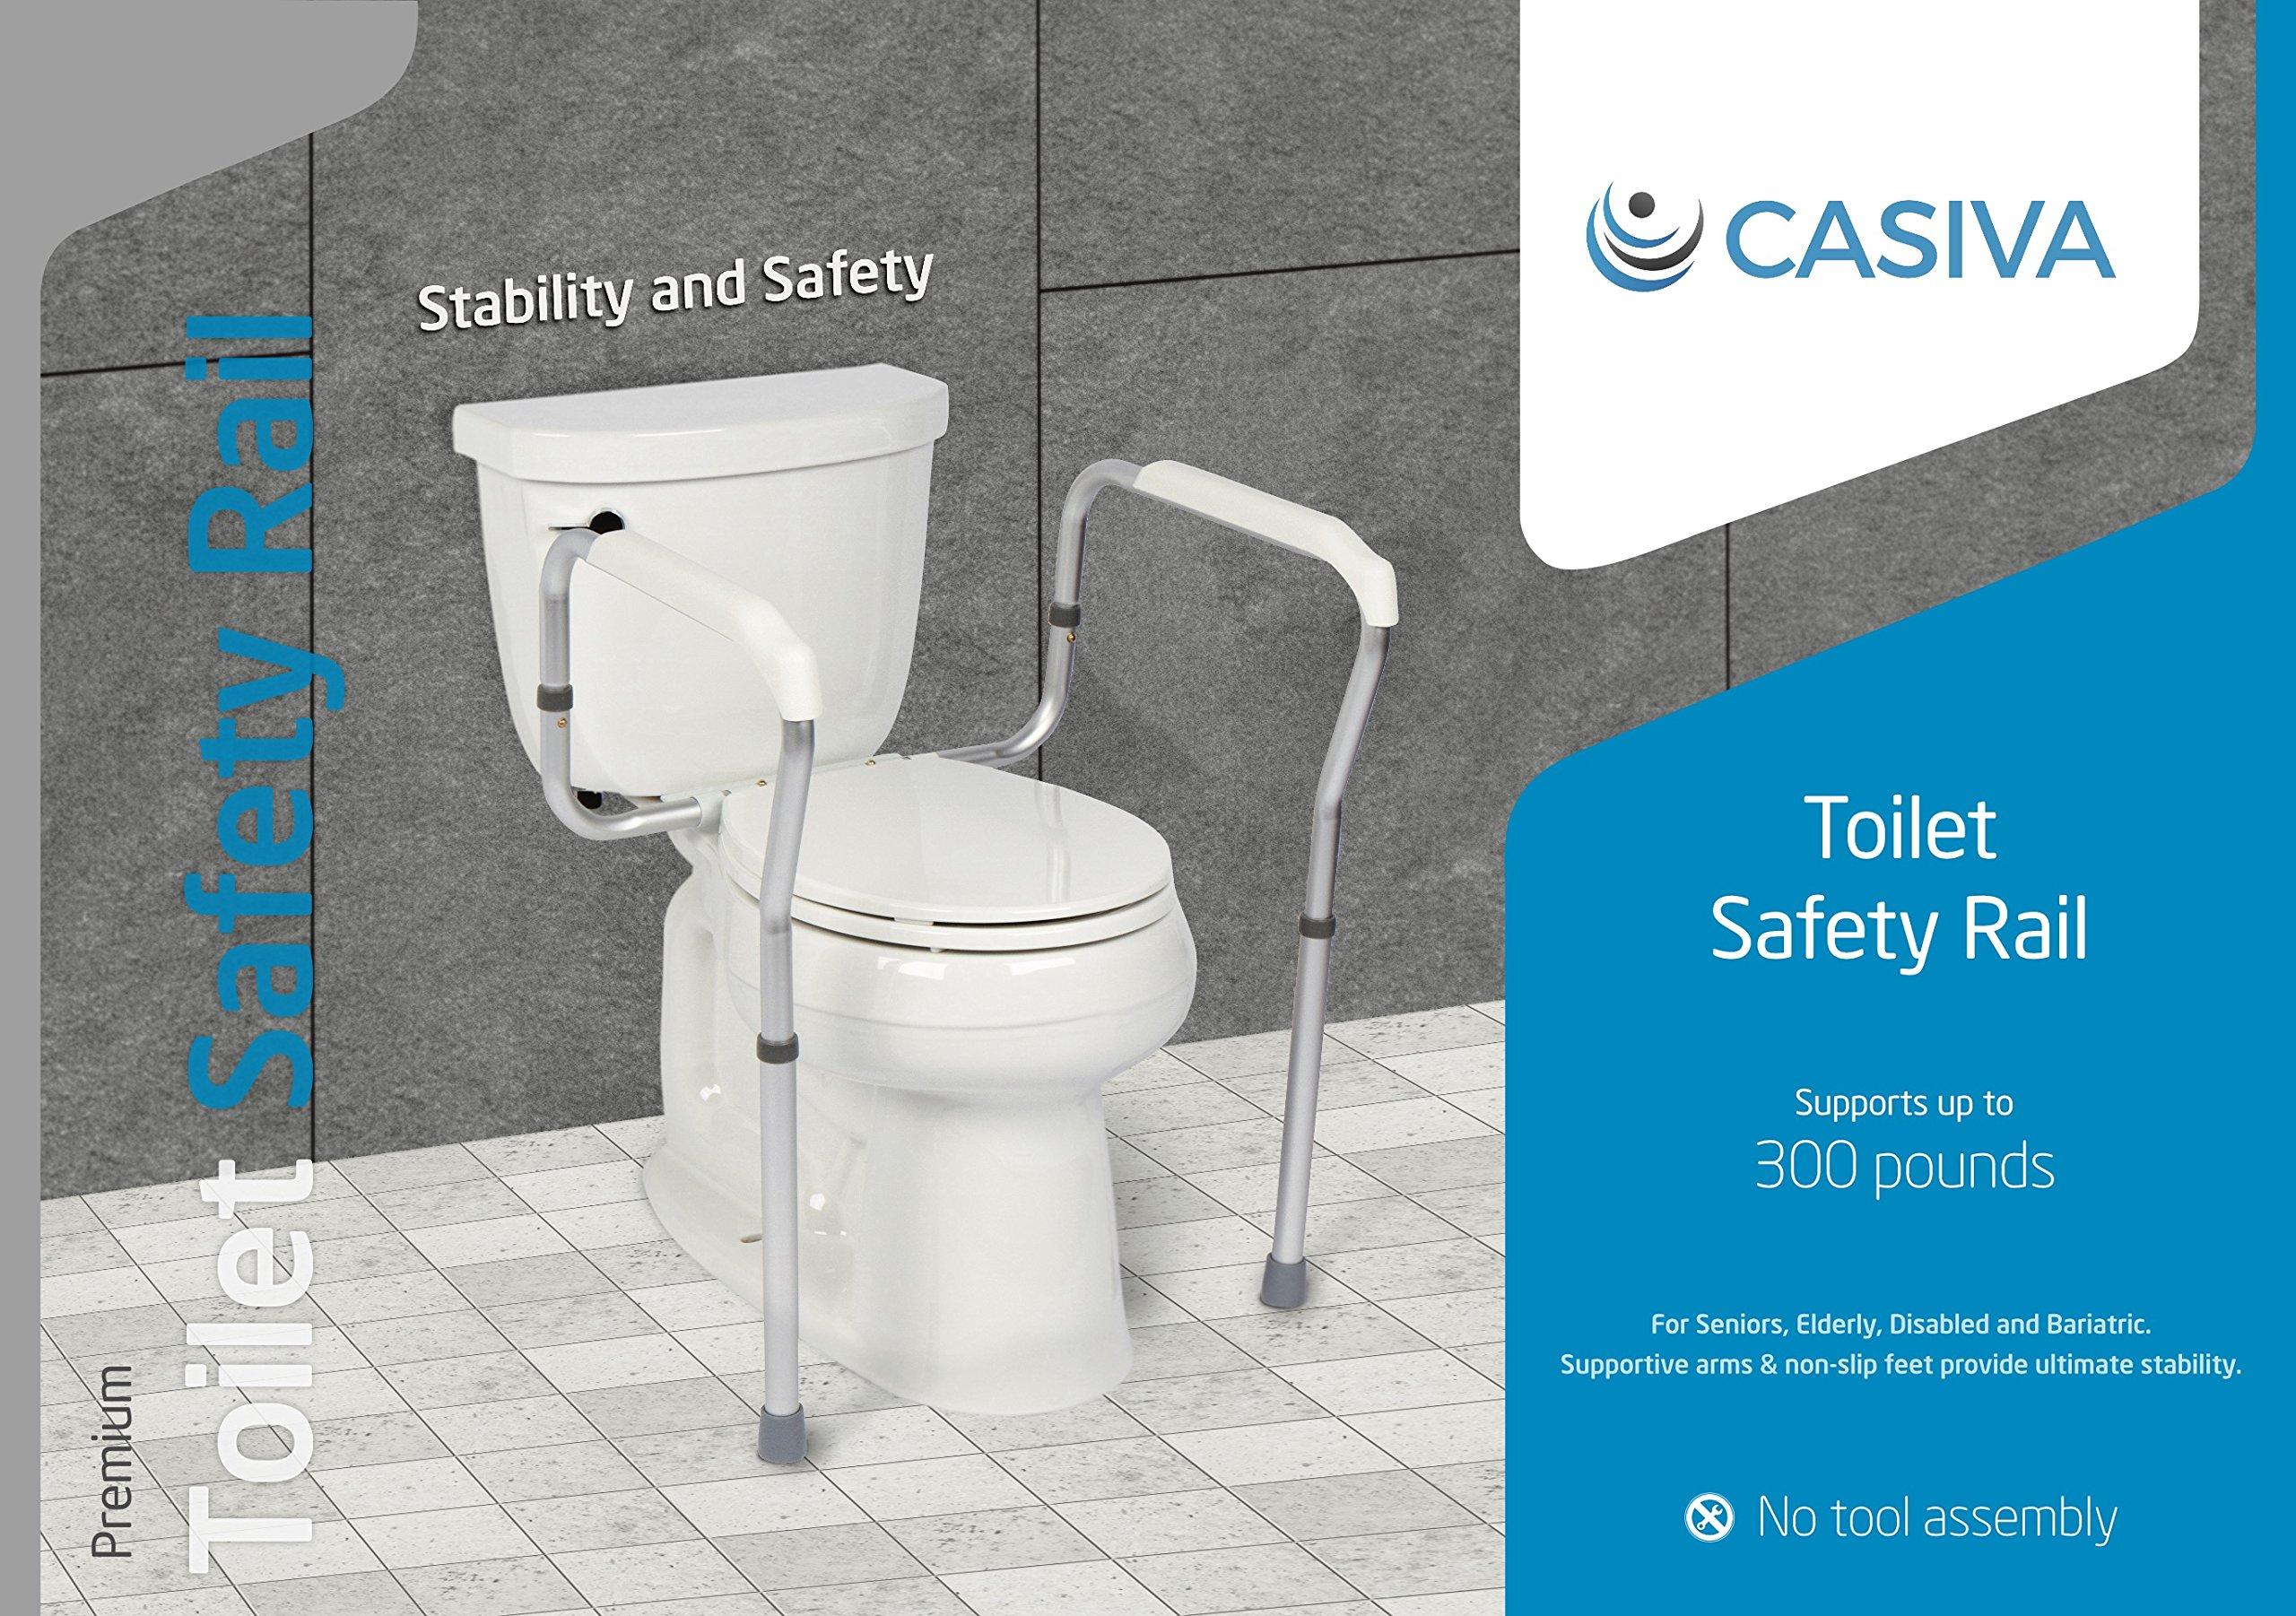 1d4172af061 Casiva Premium Toilet Safety Rail - Strong